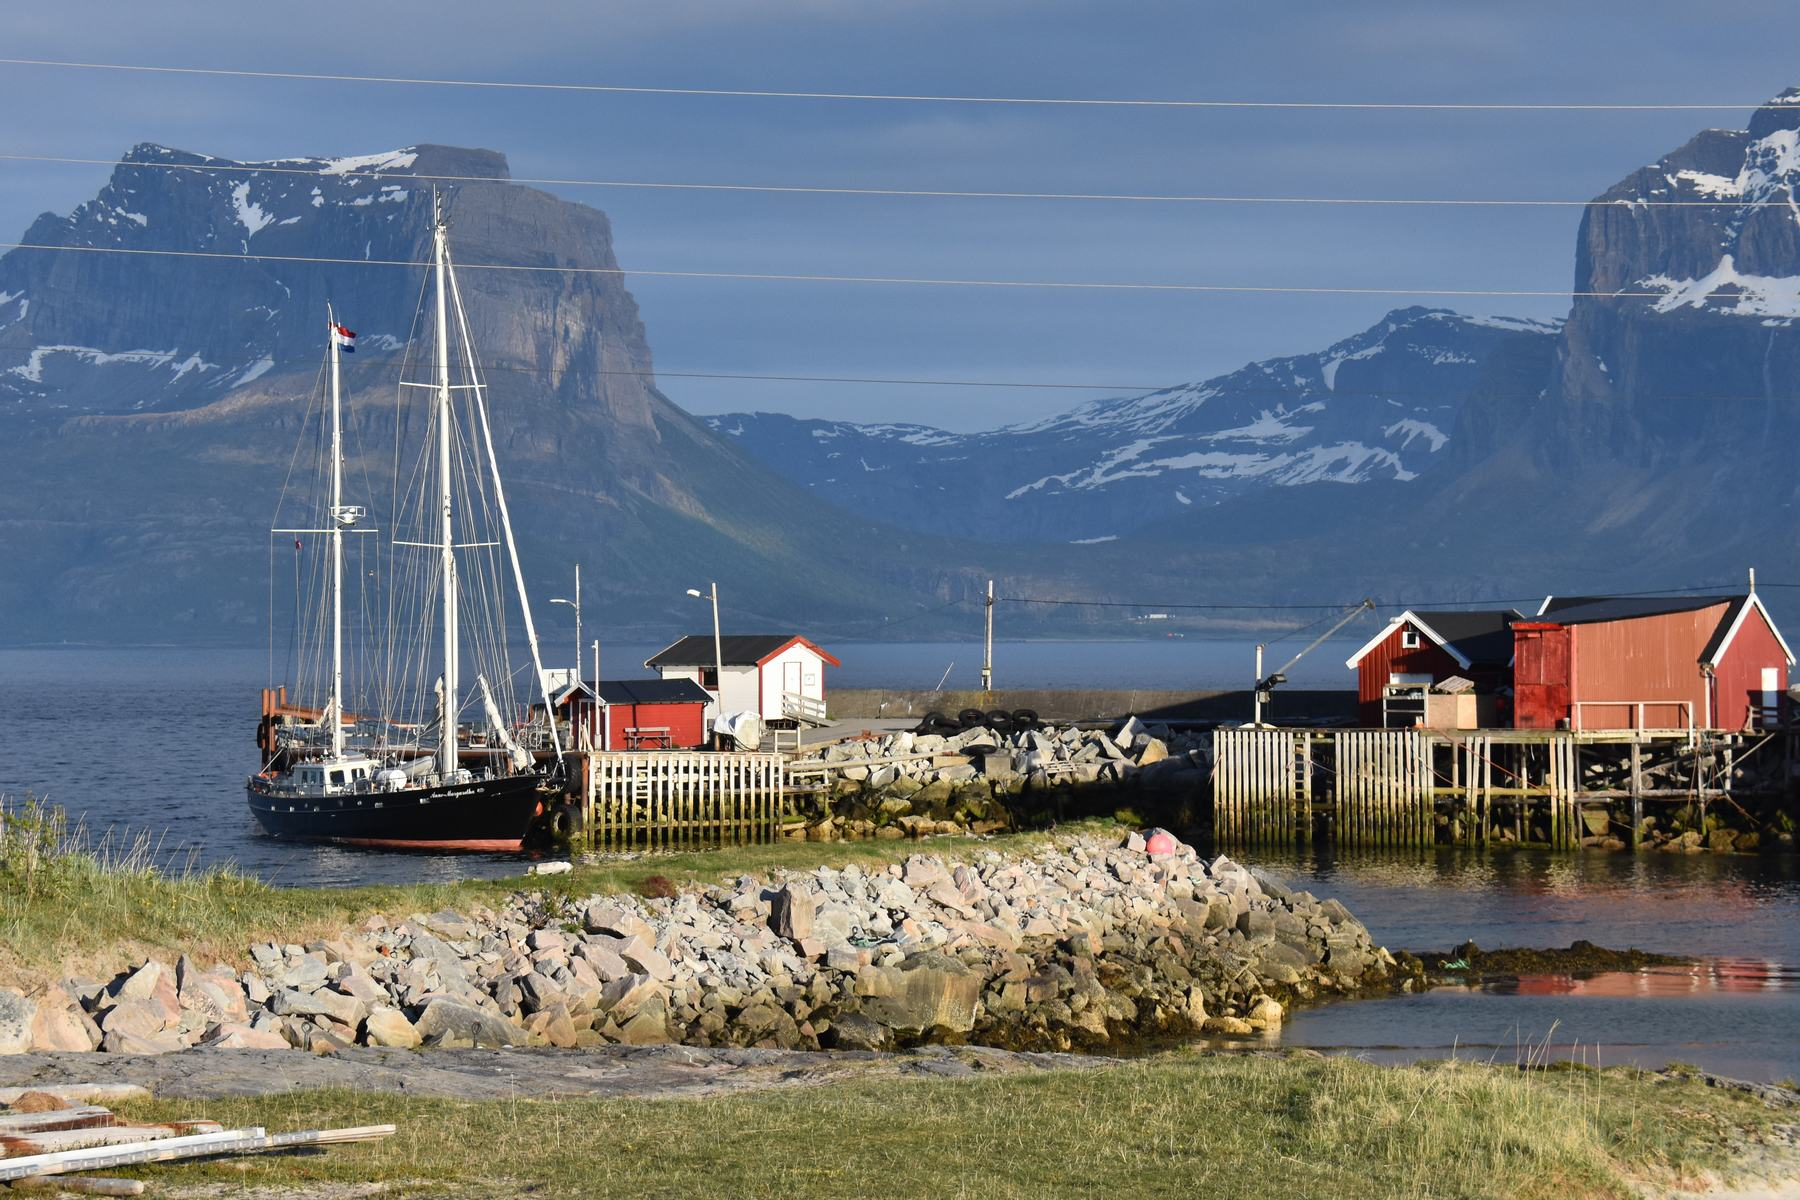 Die norwegische Küste